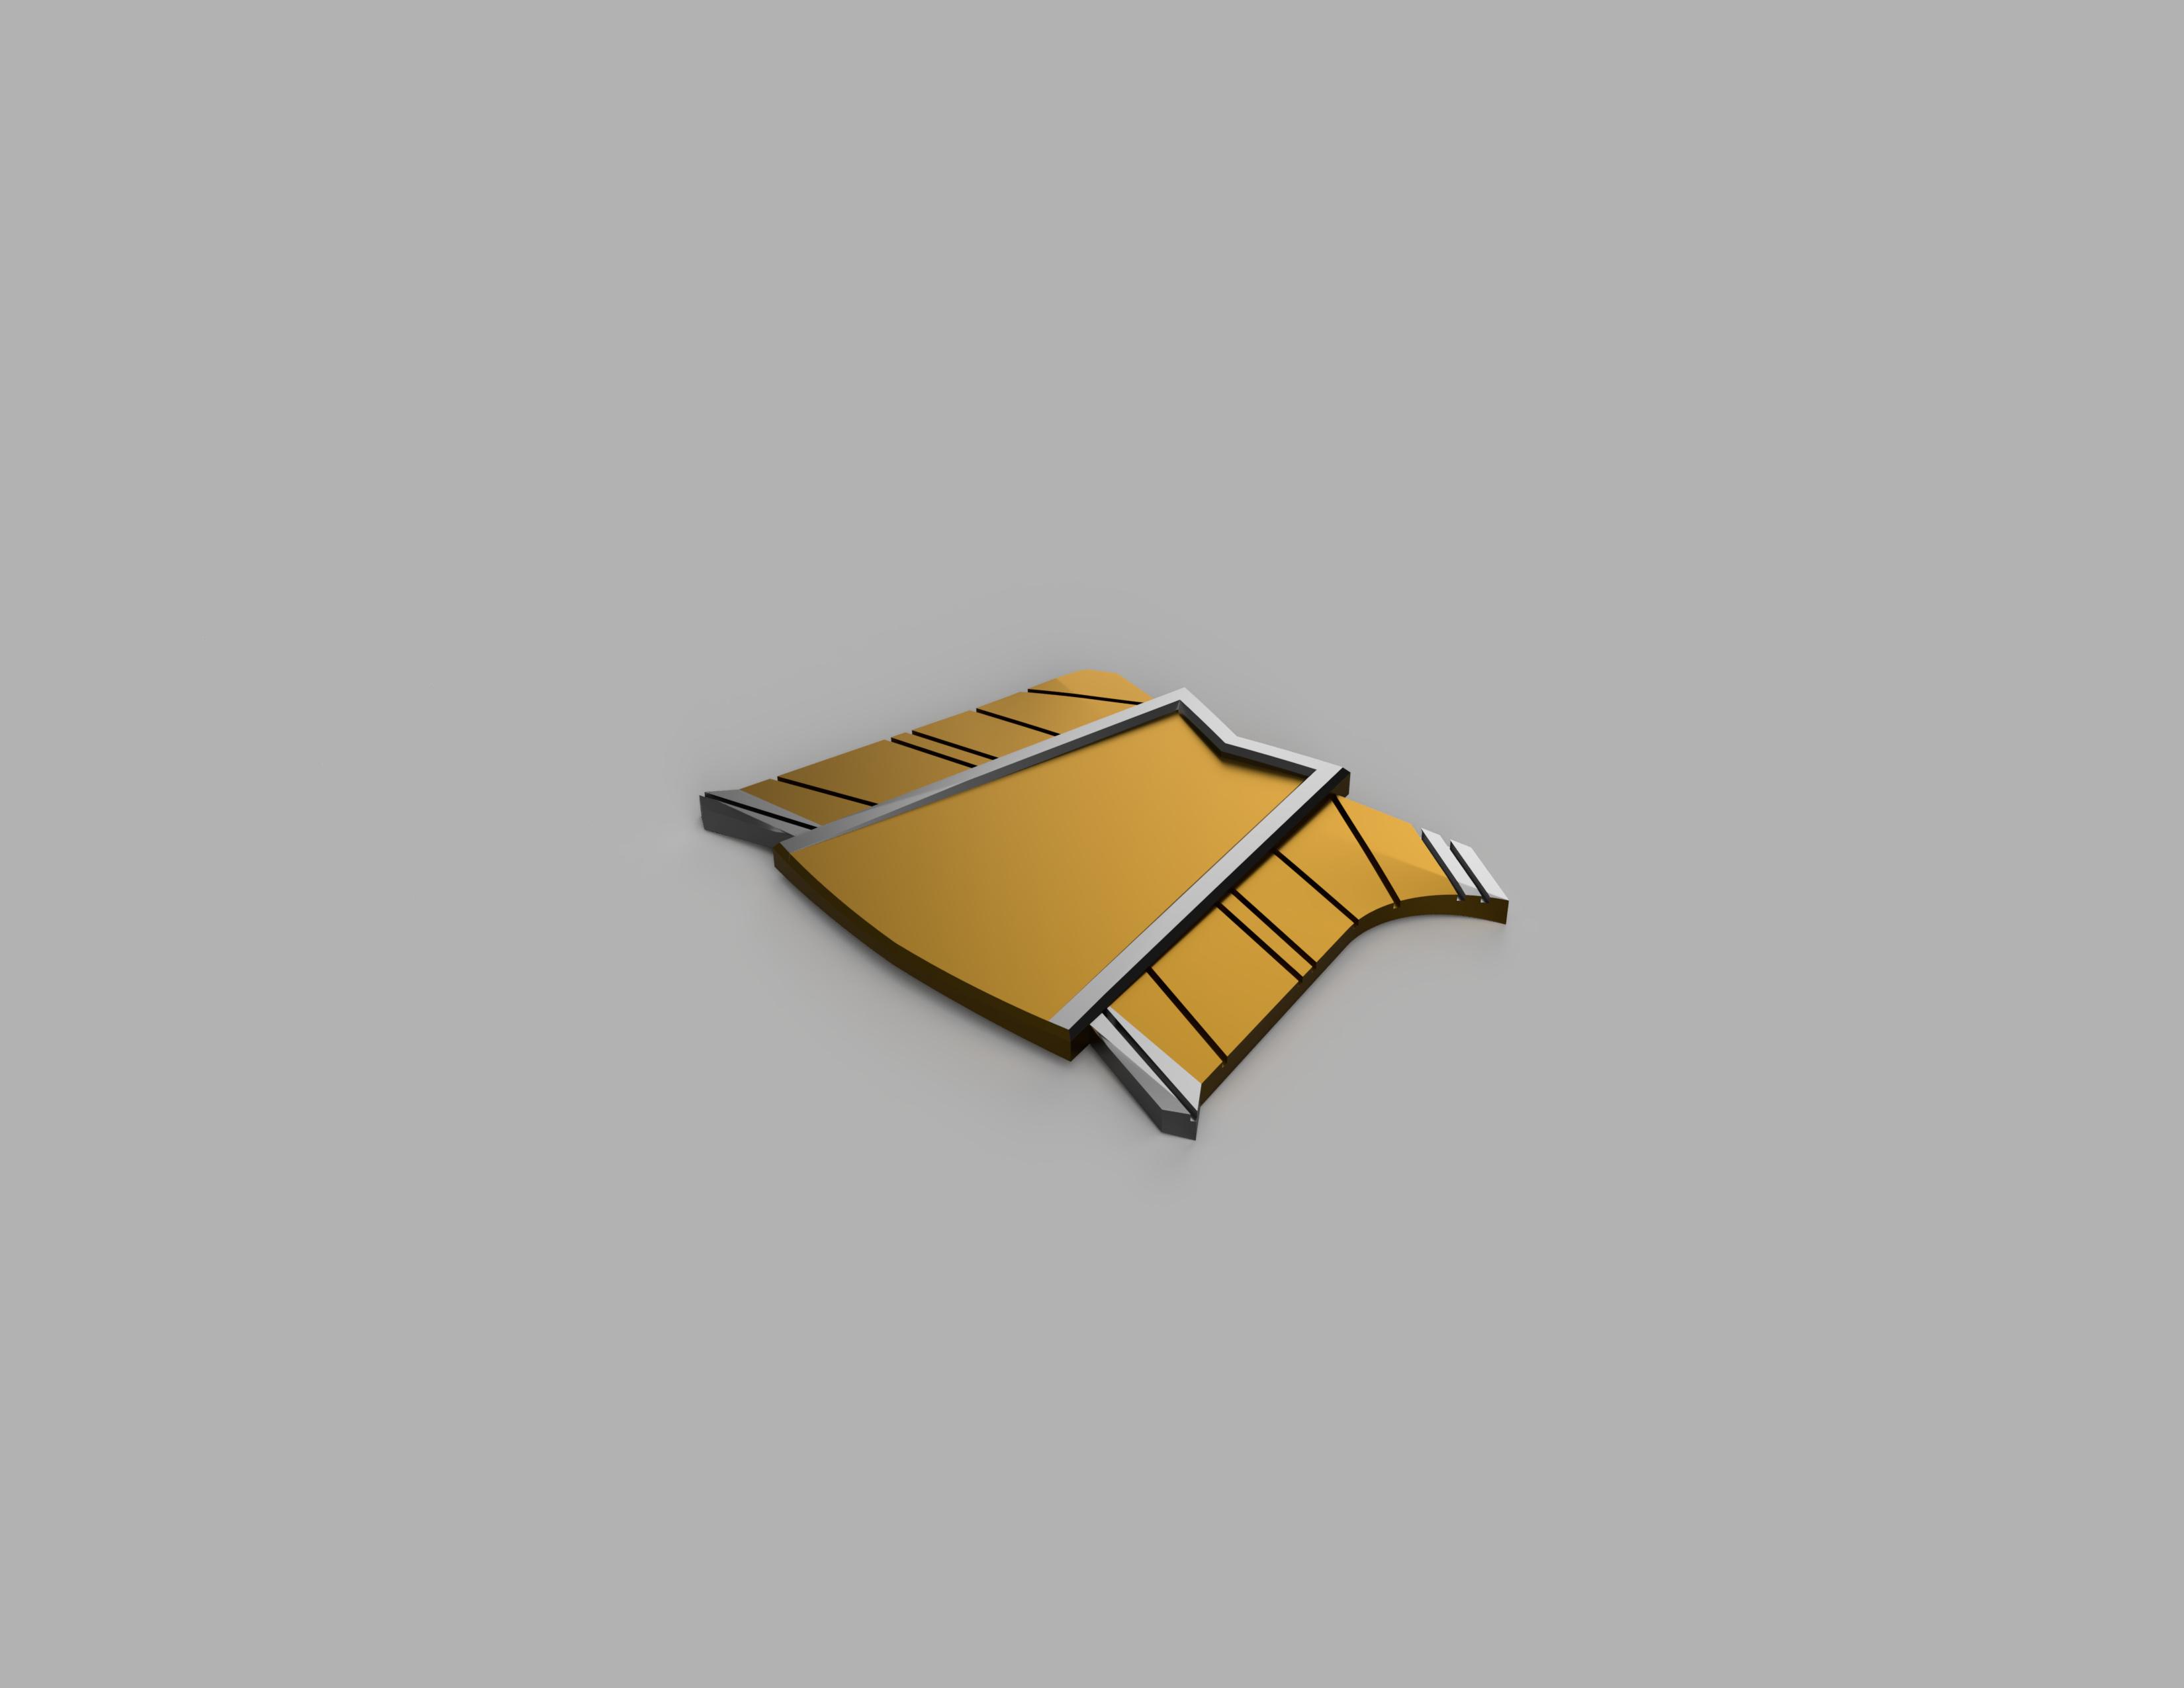 Hand_Armor_2020-Feb-10_04-26-31PM-000_CustomizedView6819100061_jpg.jpg